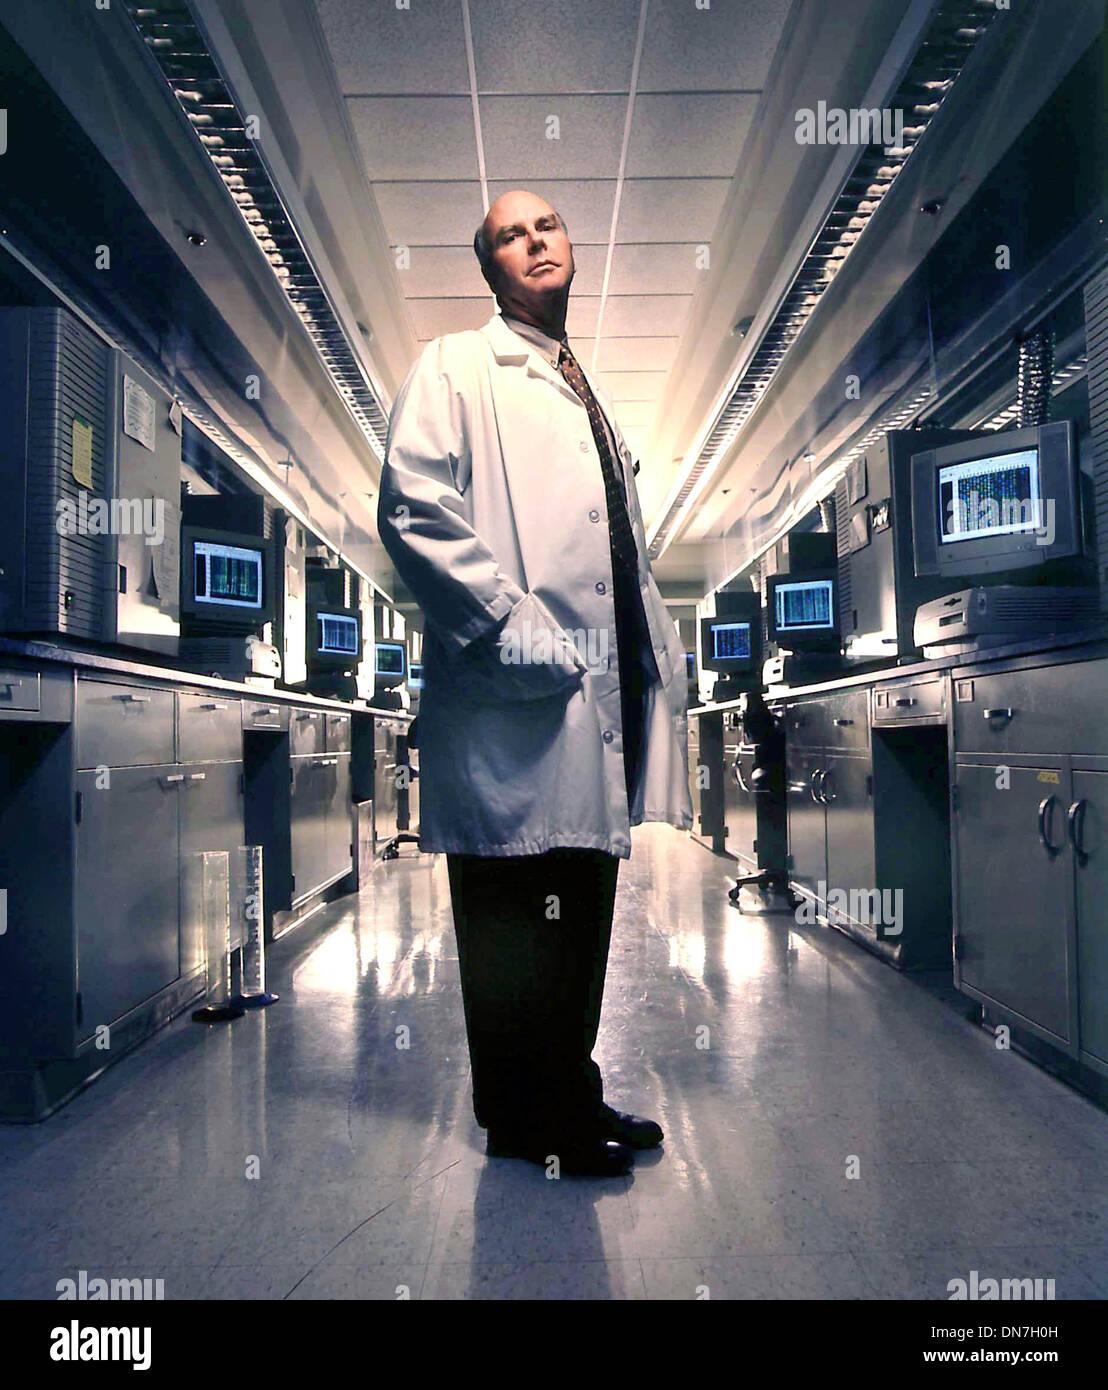 Dec. 8, 1998 - Frankfurt-Archiv, Deutschland - The archive picture of the 08.12.1998 shows Craig Venter, gene researcher Stock Photo